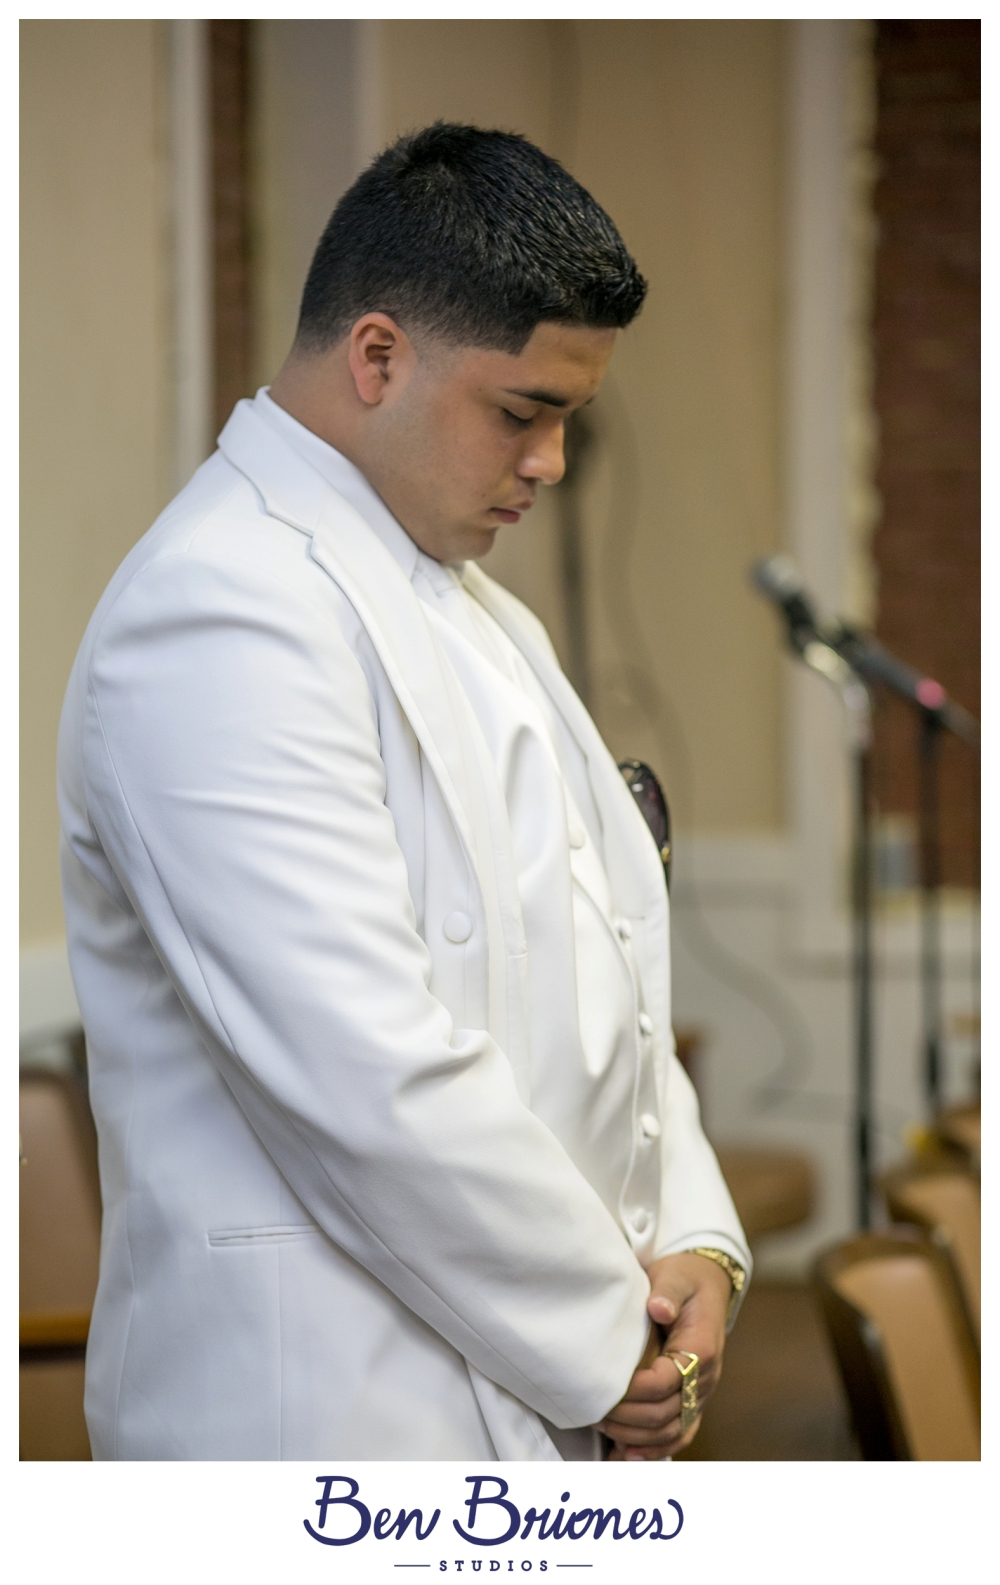 11-19-16_web_baptismal_bbs-6700_fb